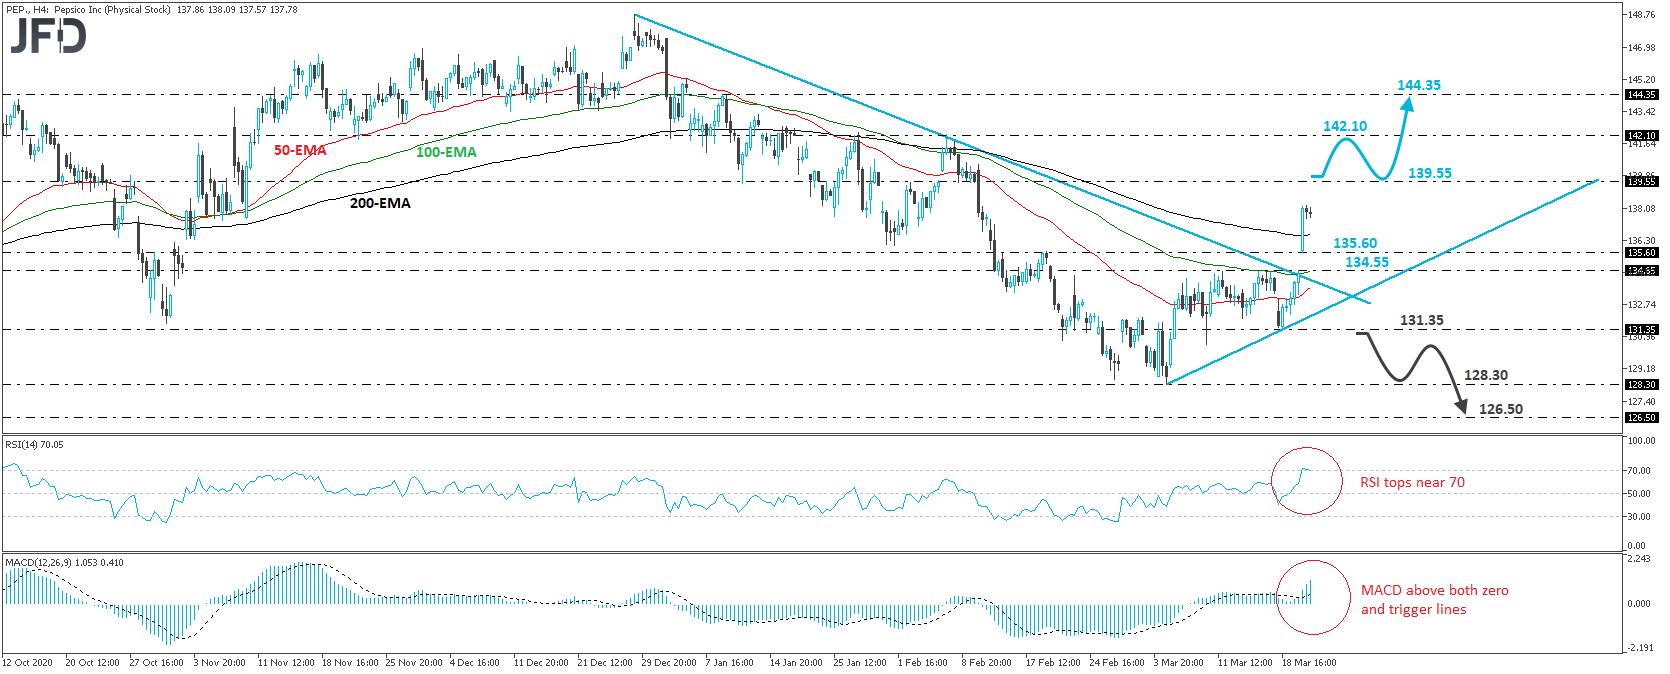 Pepsi stock 4-hour chart technical analysis